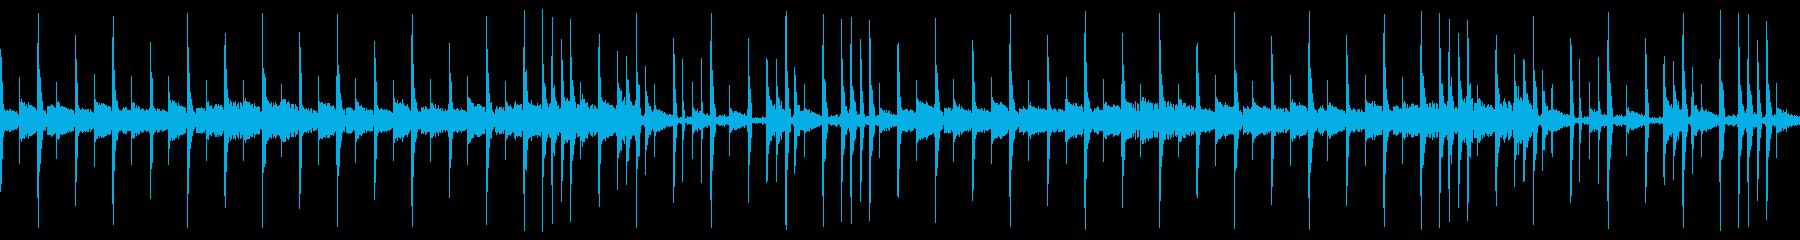 FM音源とリズムのループの再生済みの波形